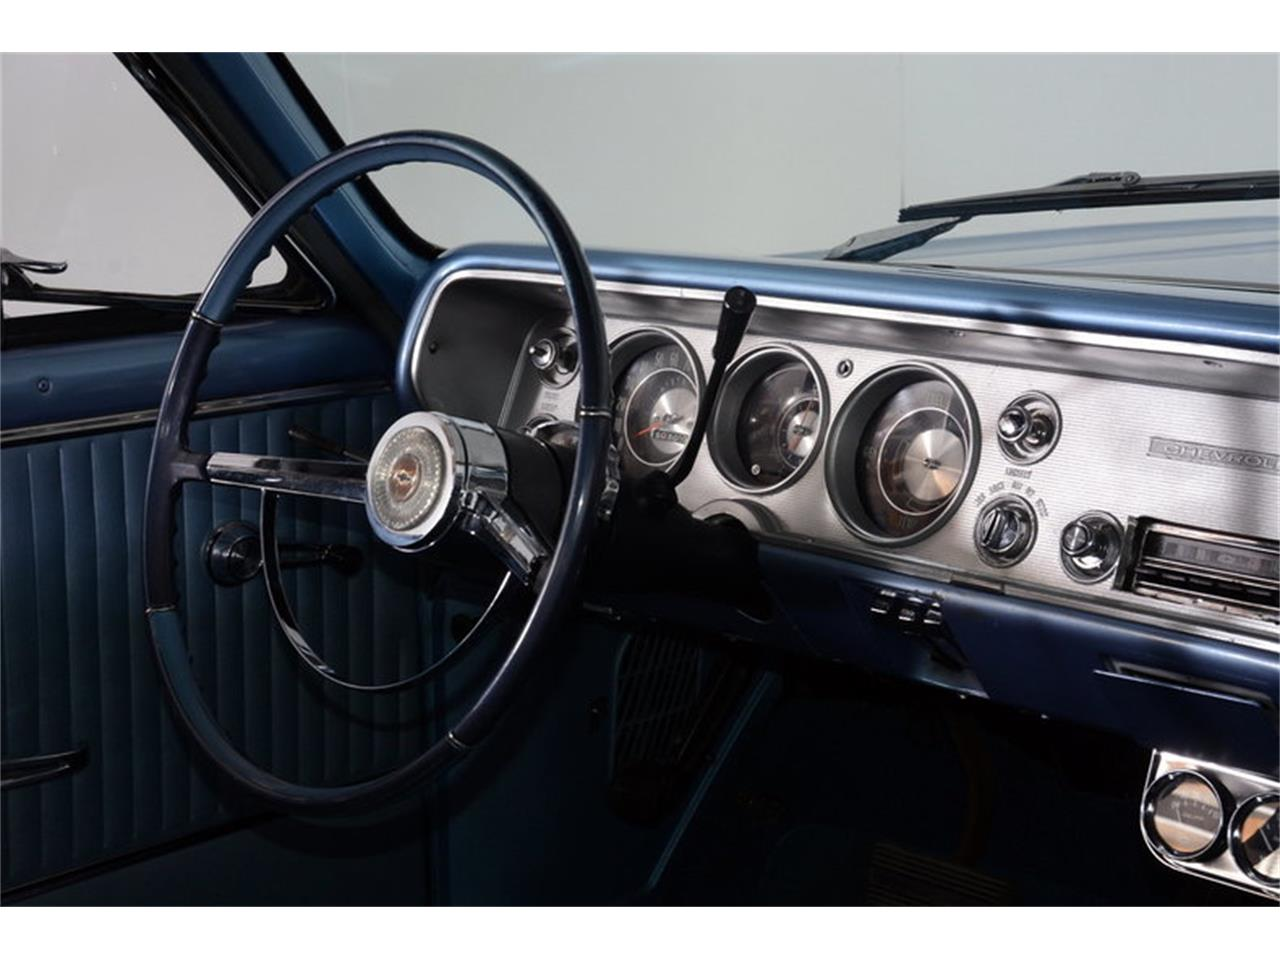 Large Picture of 1964 Chevelle Malibu located in Illinois - $29,998.00 - L5M9